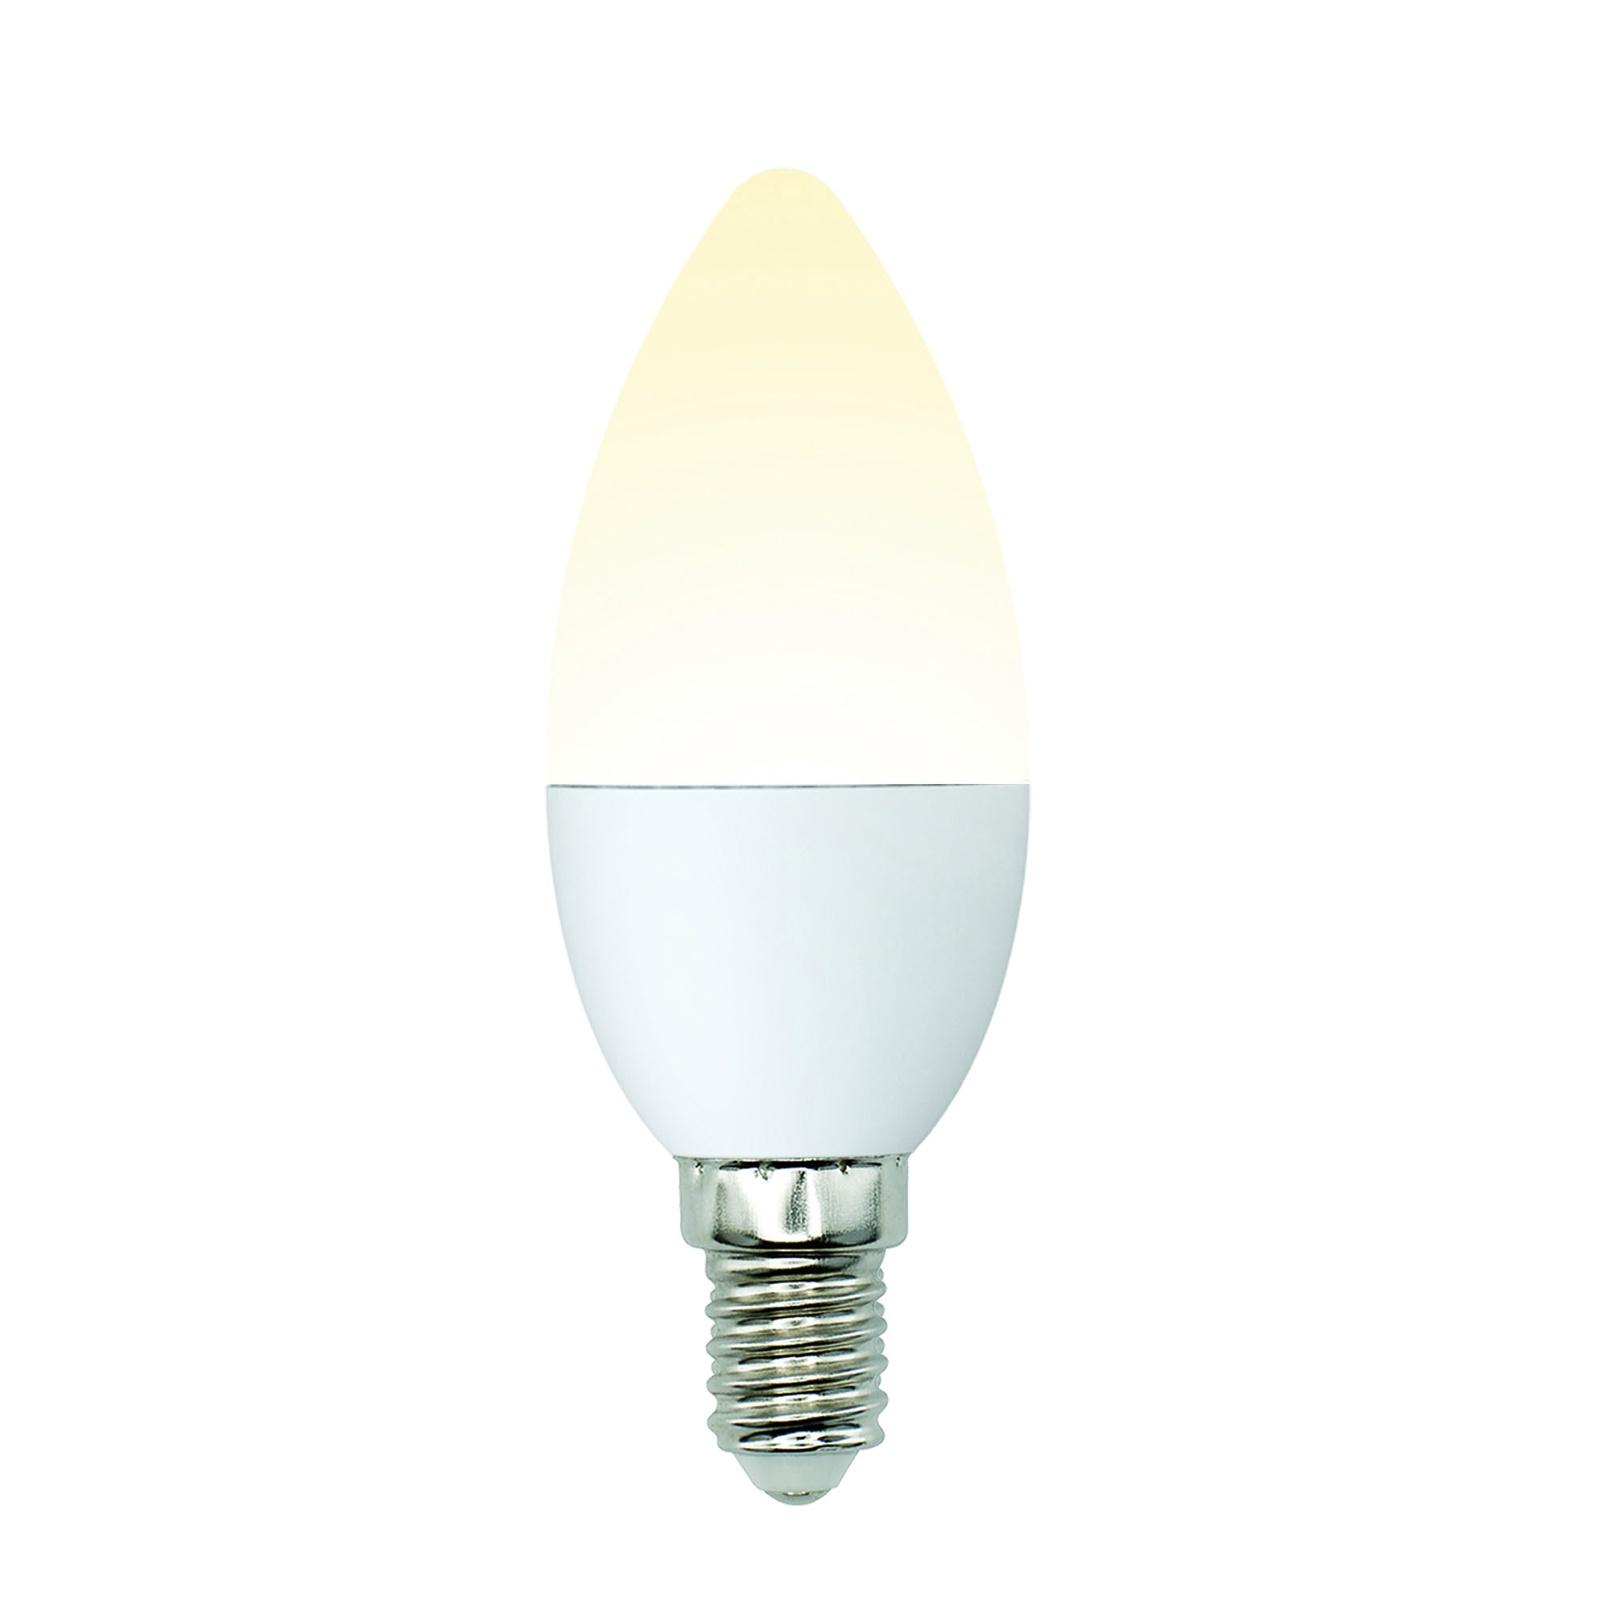 Лампочка Uniel LED-C37-6W/WW/E14/FR/MB 3000K, Теплый свет 6 Вт, Светодиодная